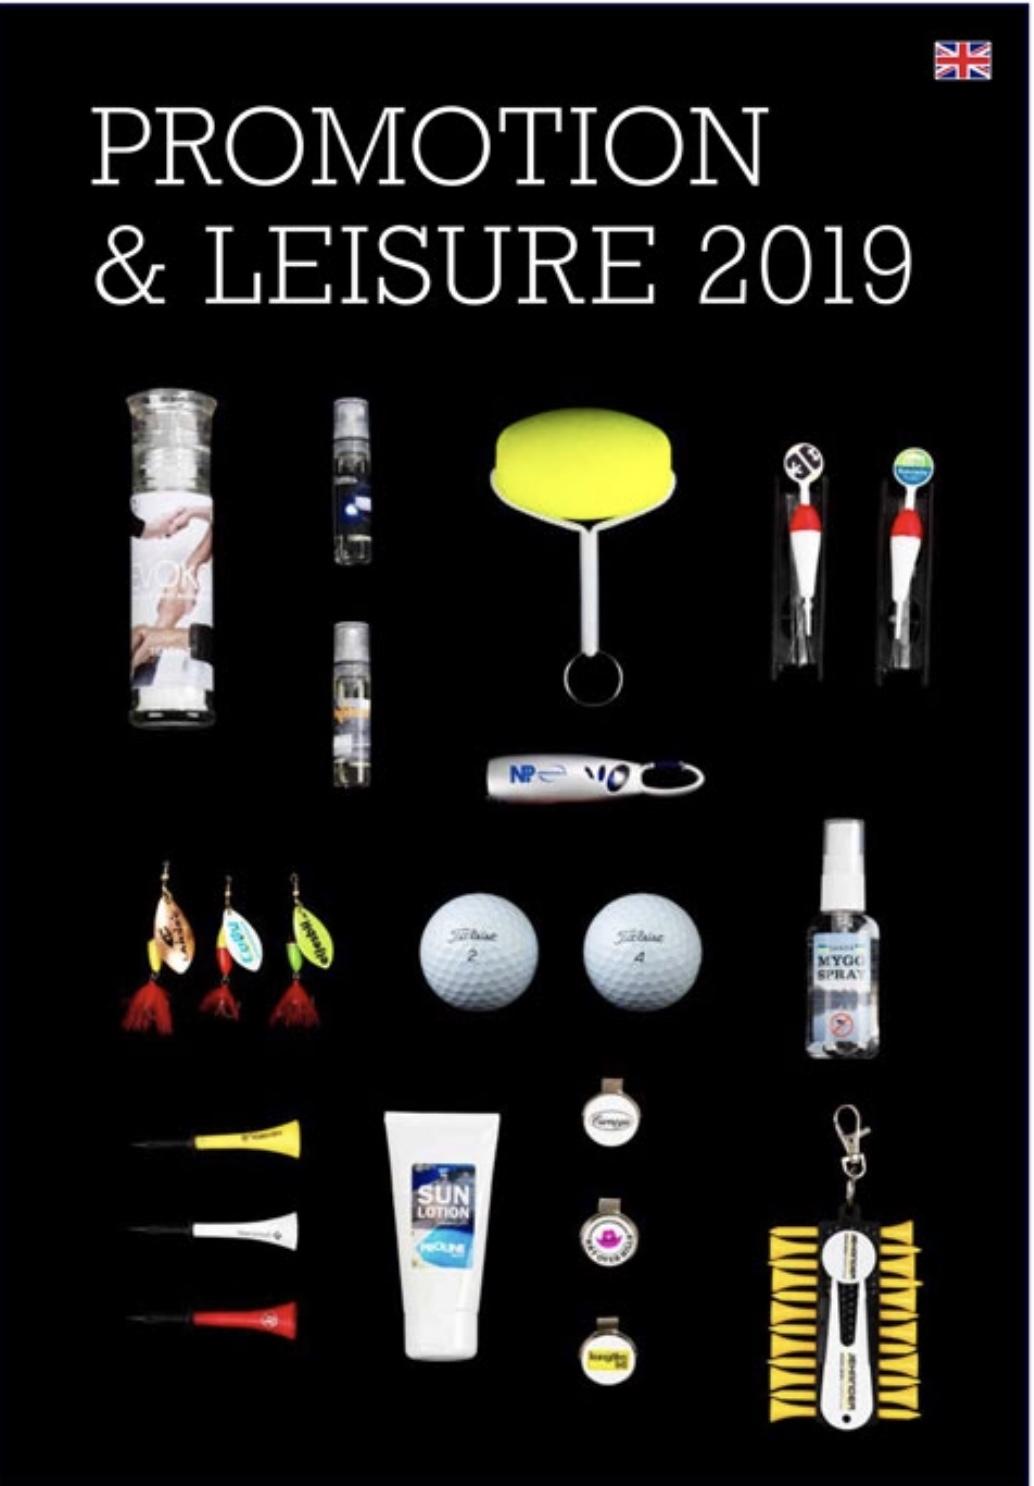 Promotion & Leisure 2019